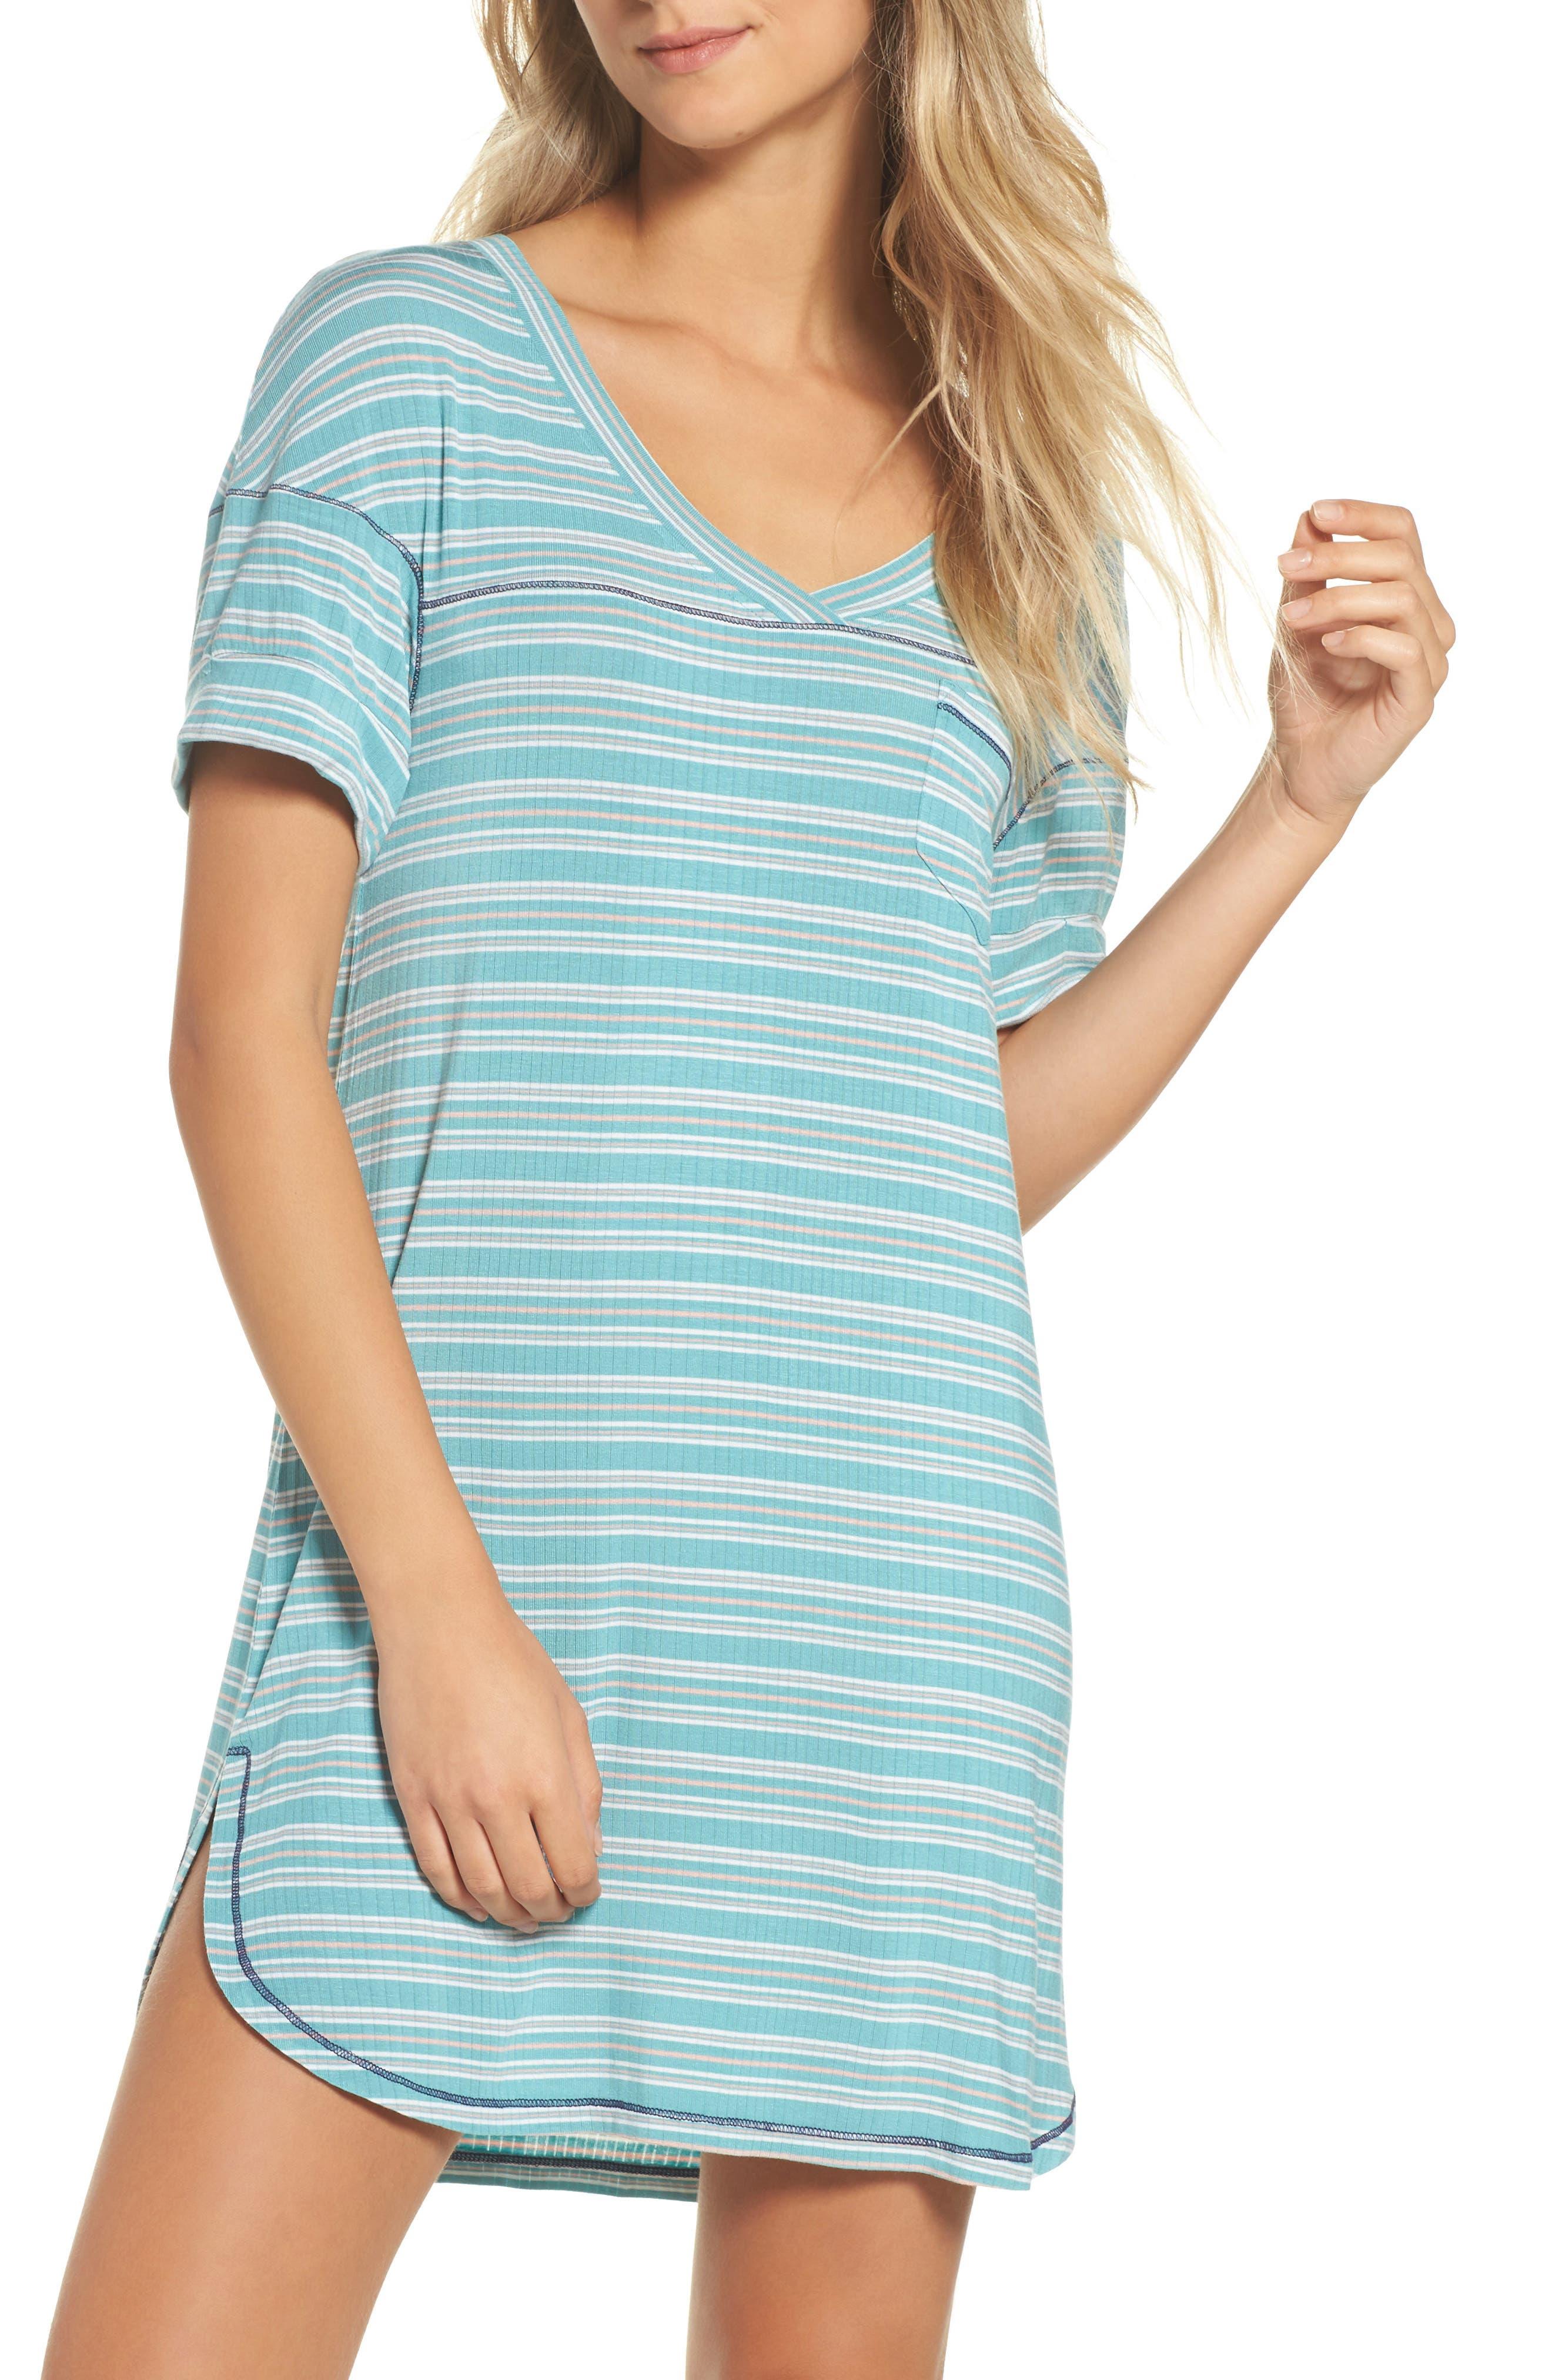 Rib Sleep Shirt,                         Main,                         color, 300